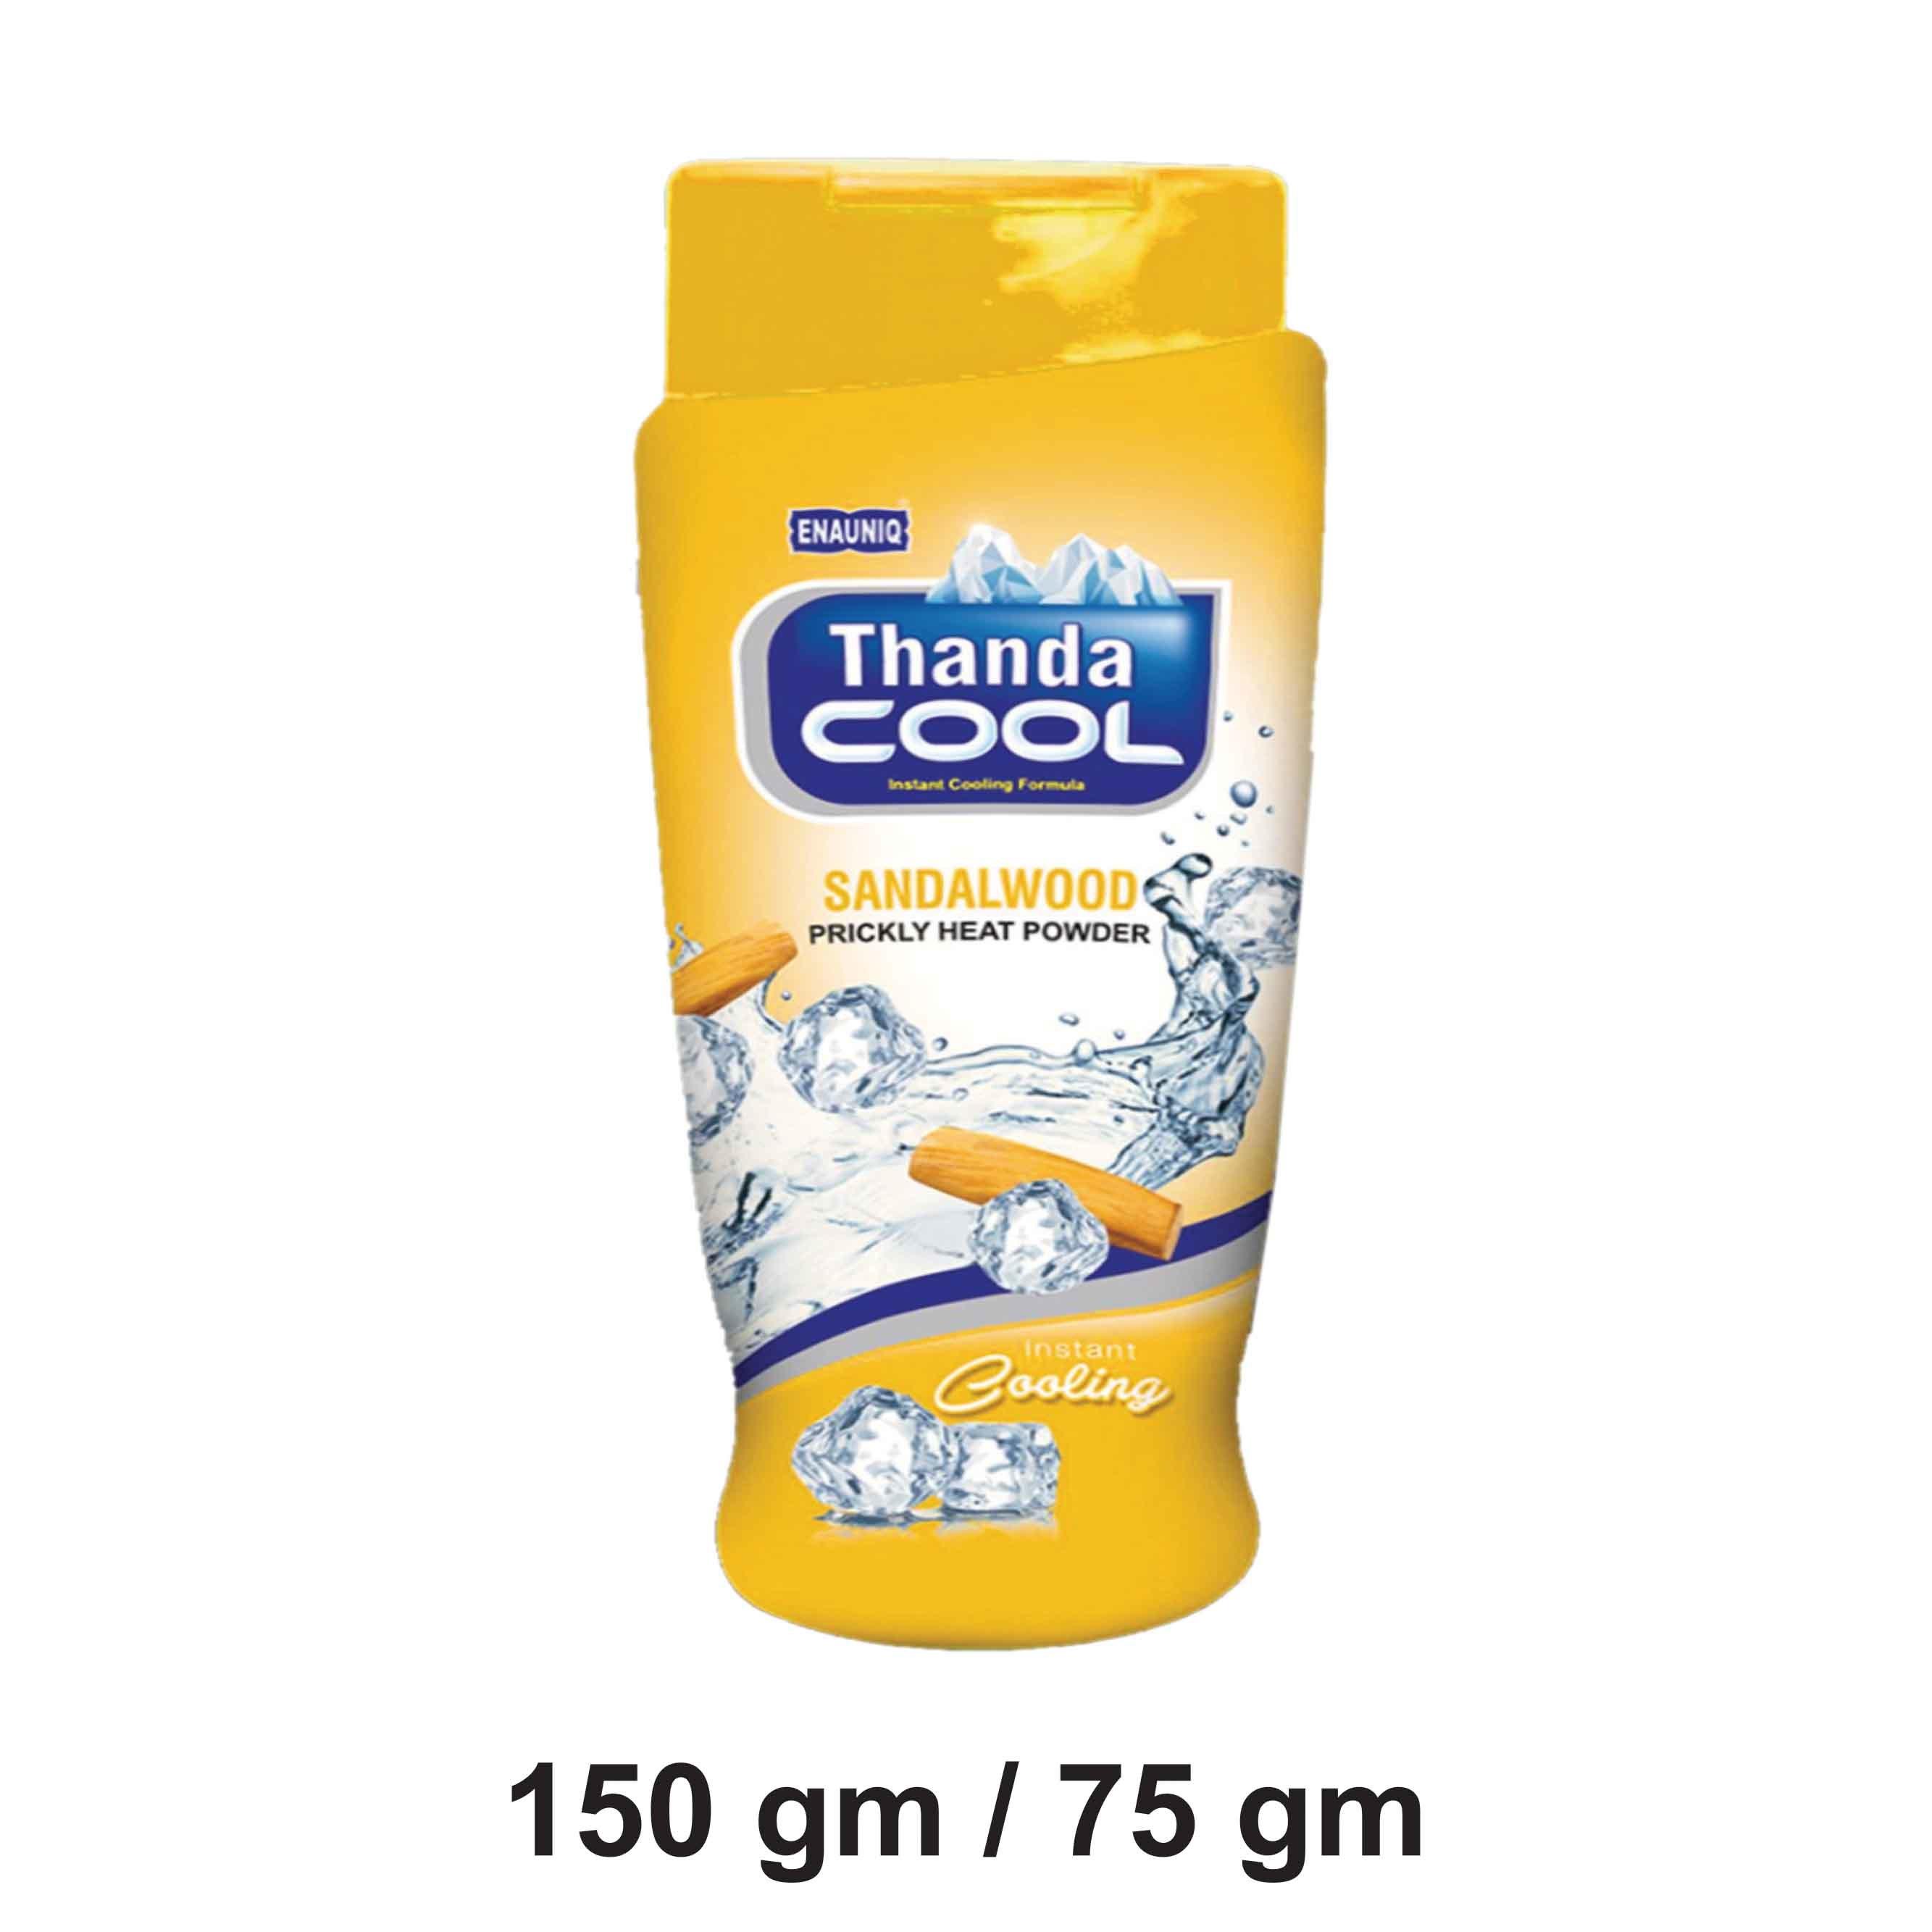 Prickly Heat Powder